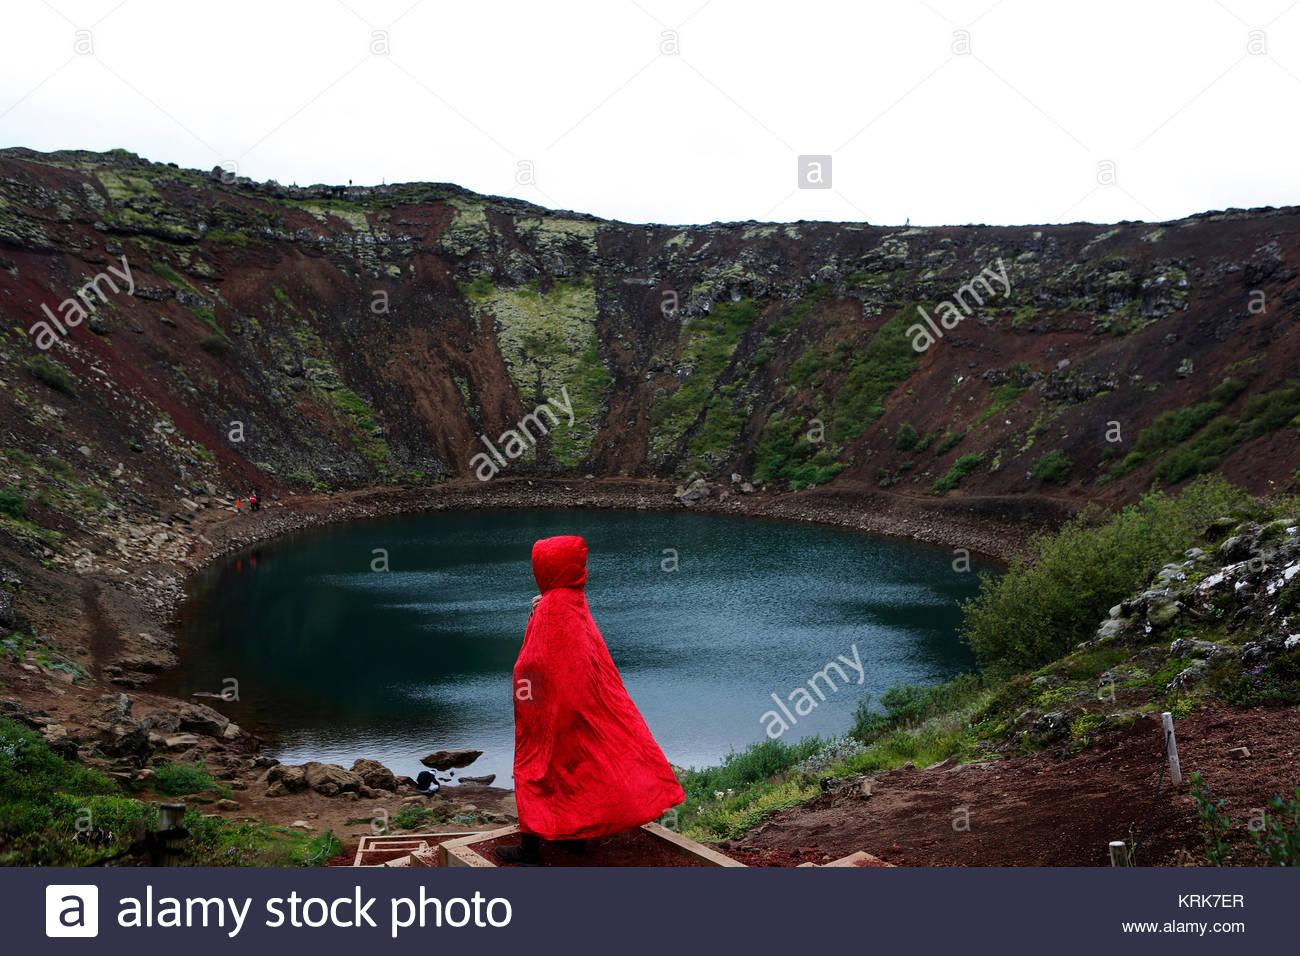 Caucasian woman wearing red robe at volcano lake - Stock Image